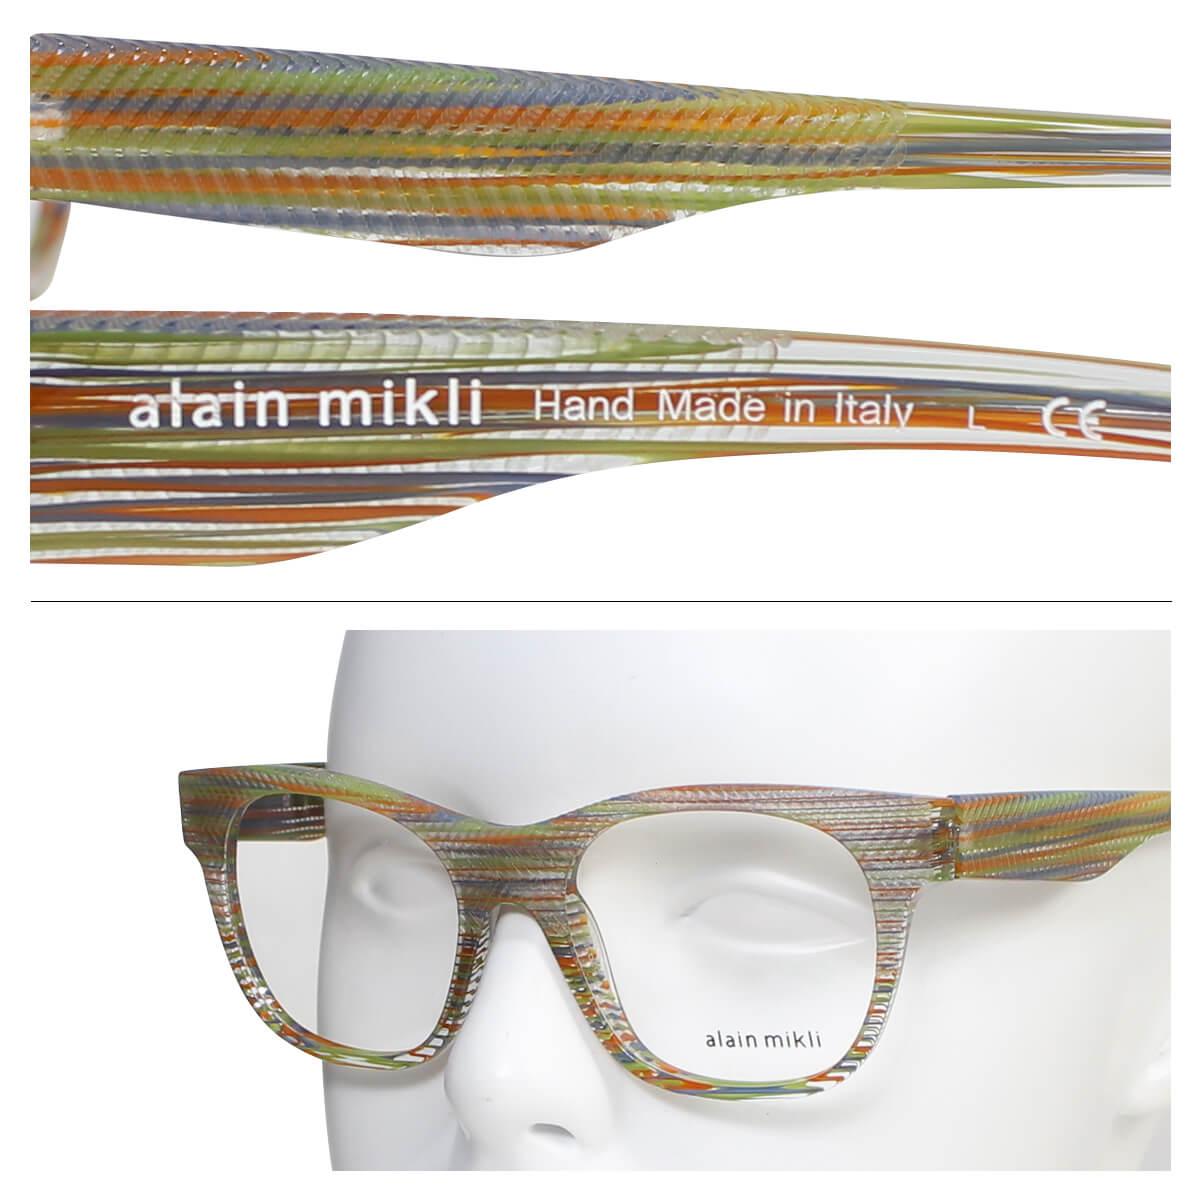 alain mikli メガネ アランミクリ メガネフレーム 眼鏡 イタリア製 メンズ レディース